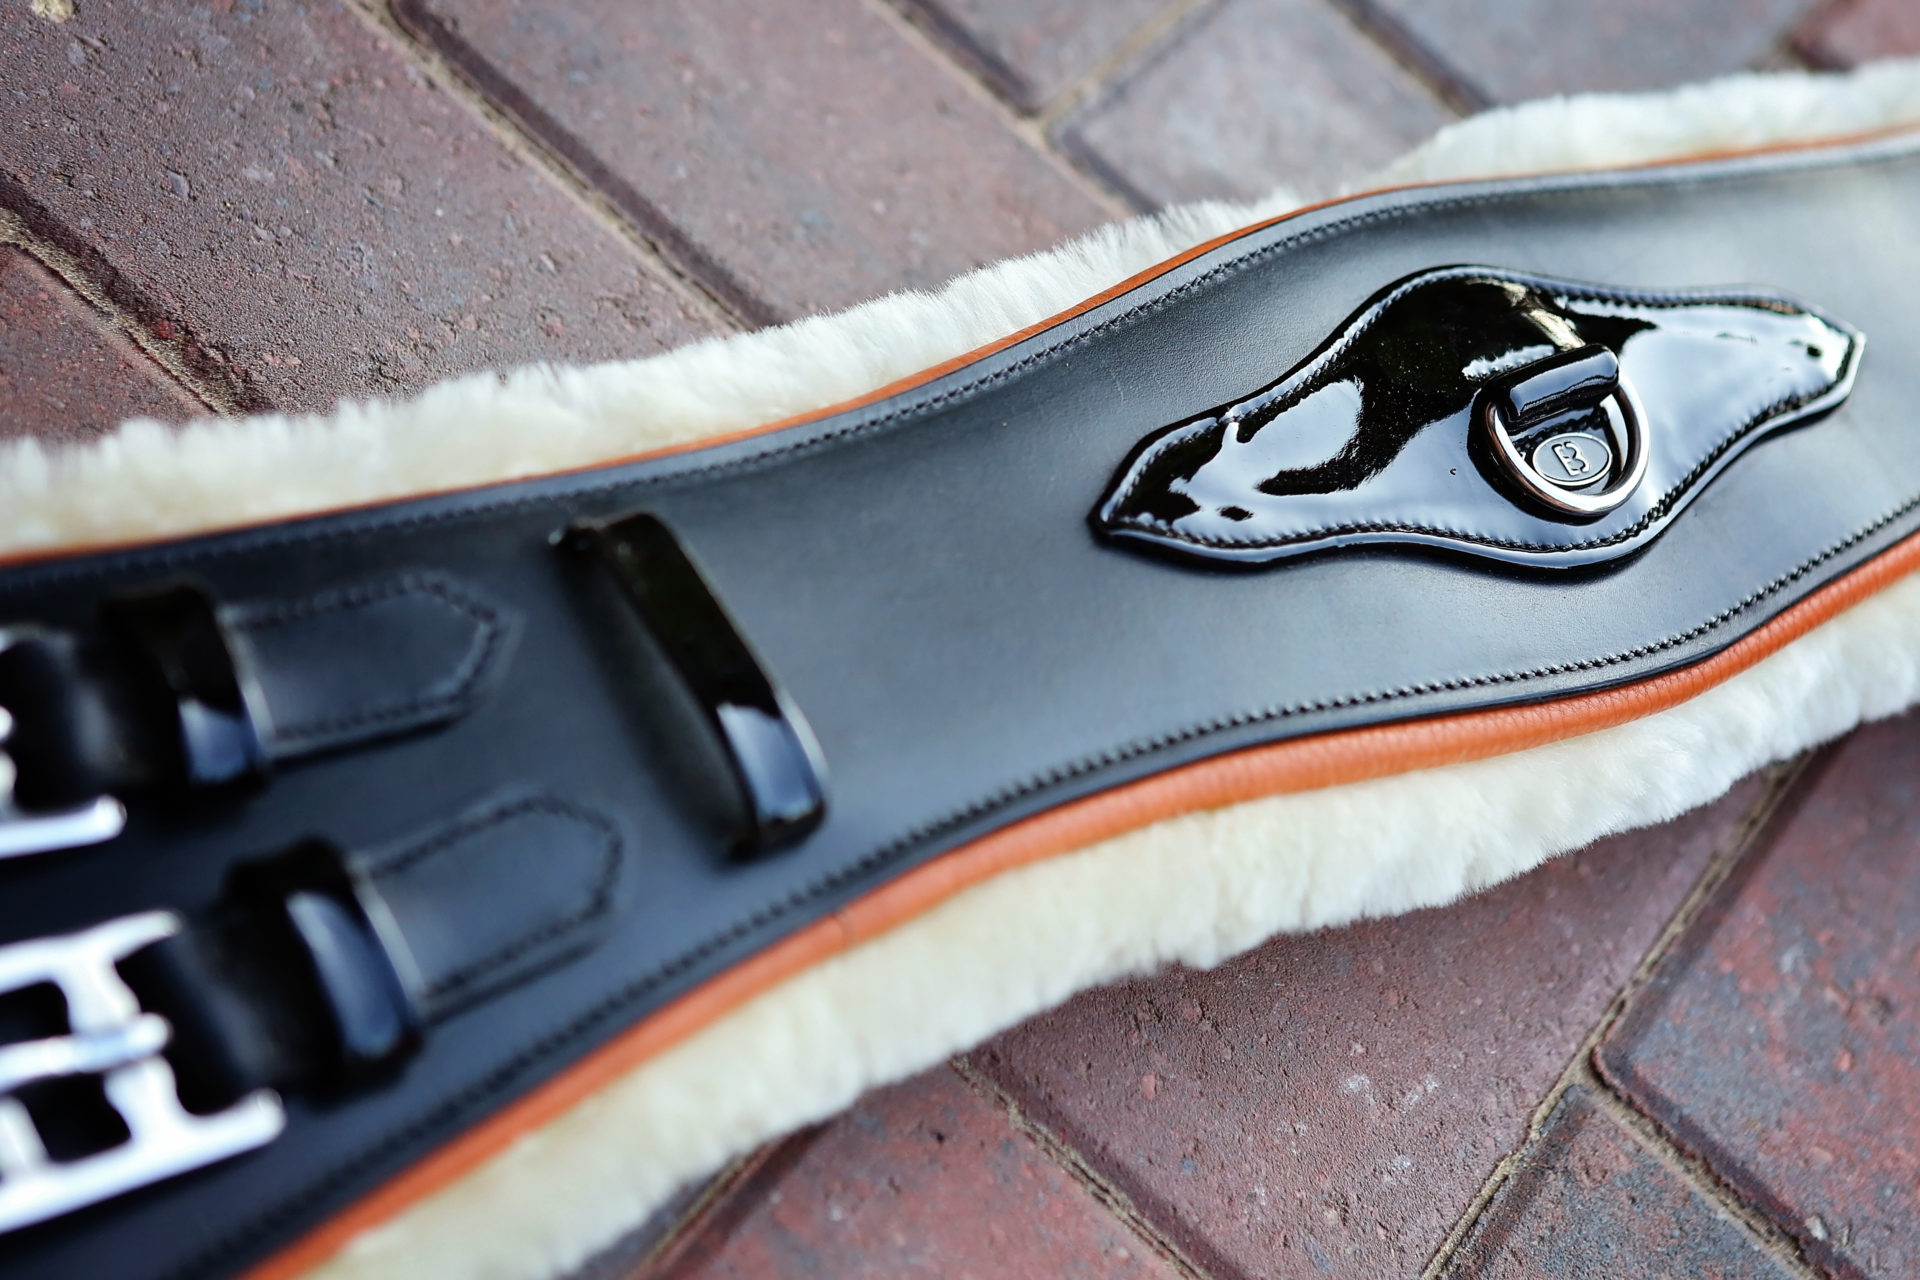 Orange sheepskin leather girth